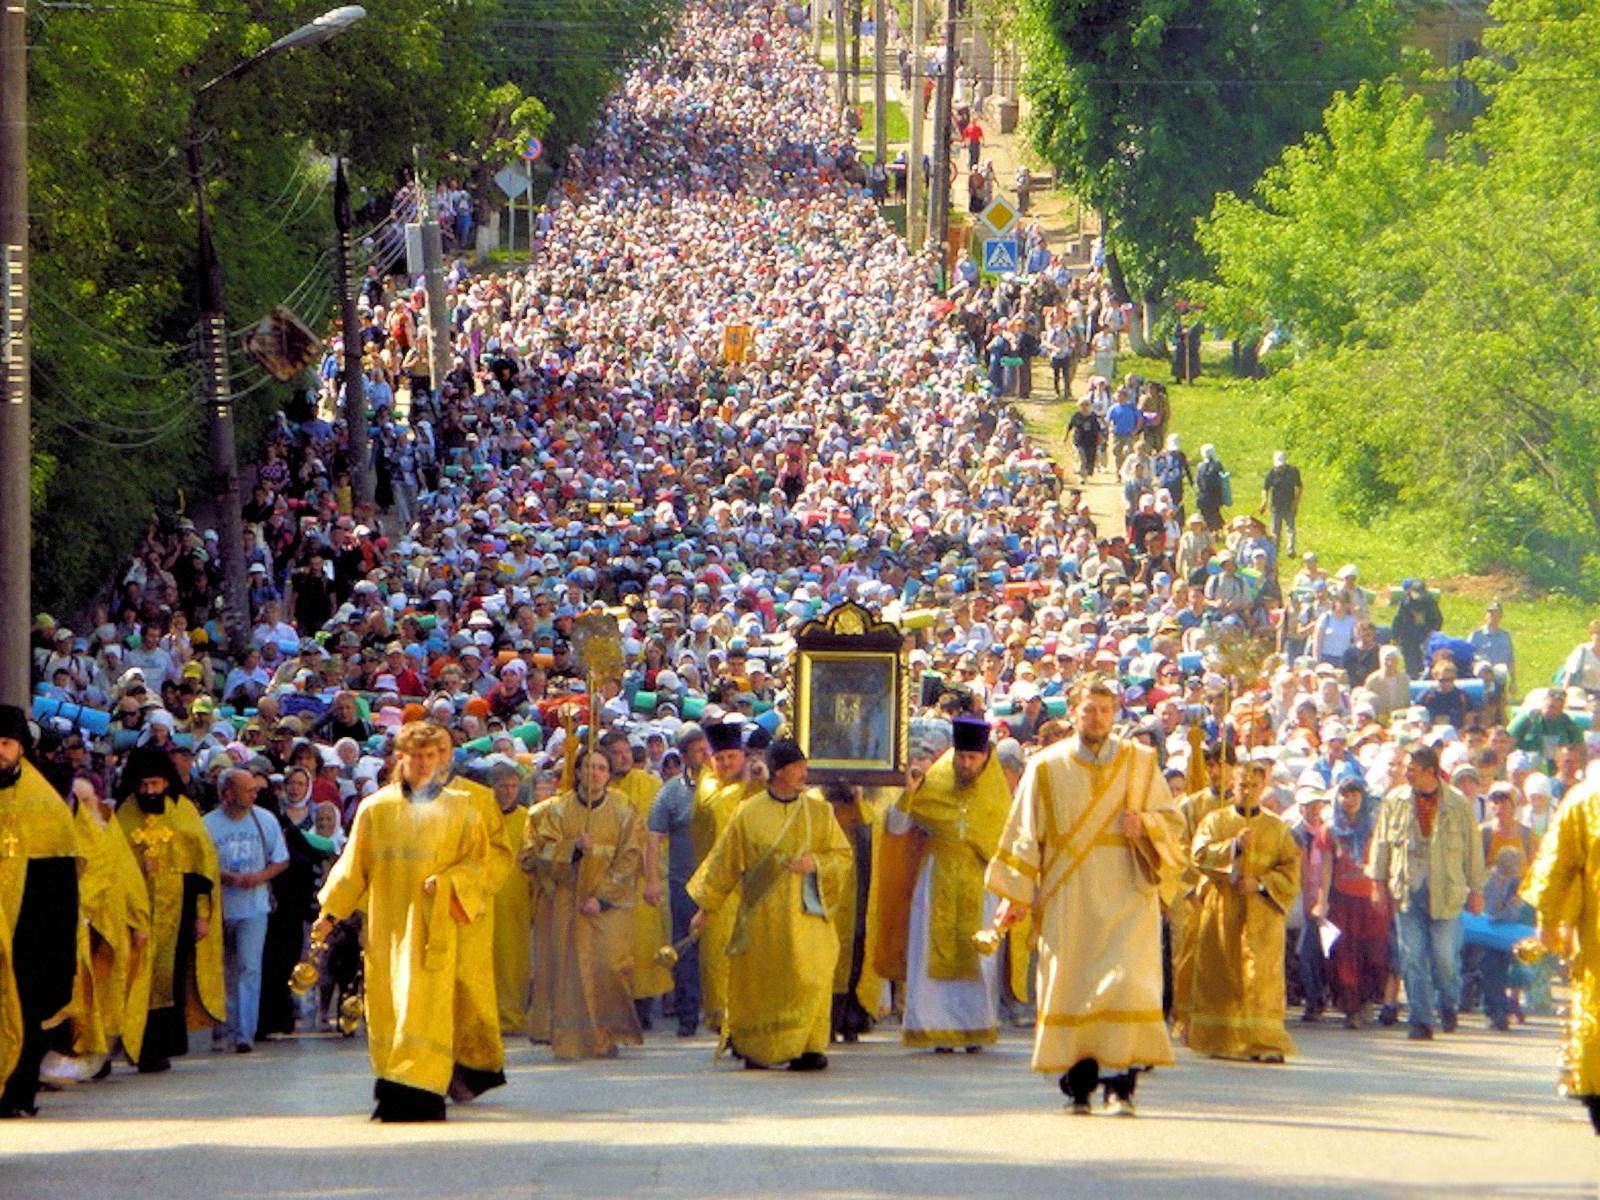 00 russia ukraine religious peace procession 200716